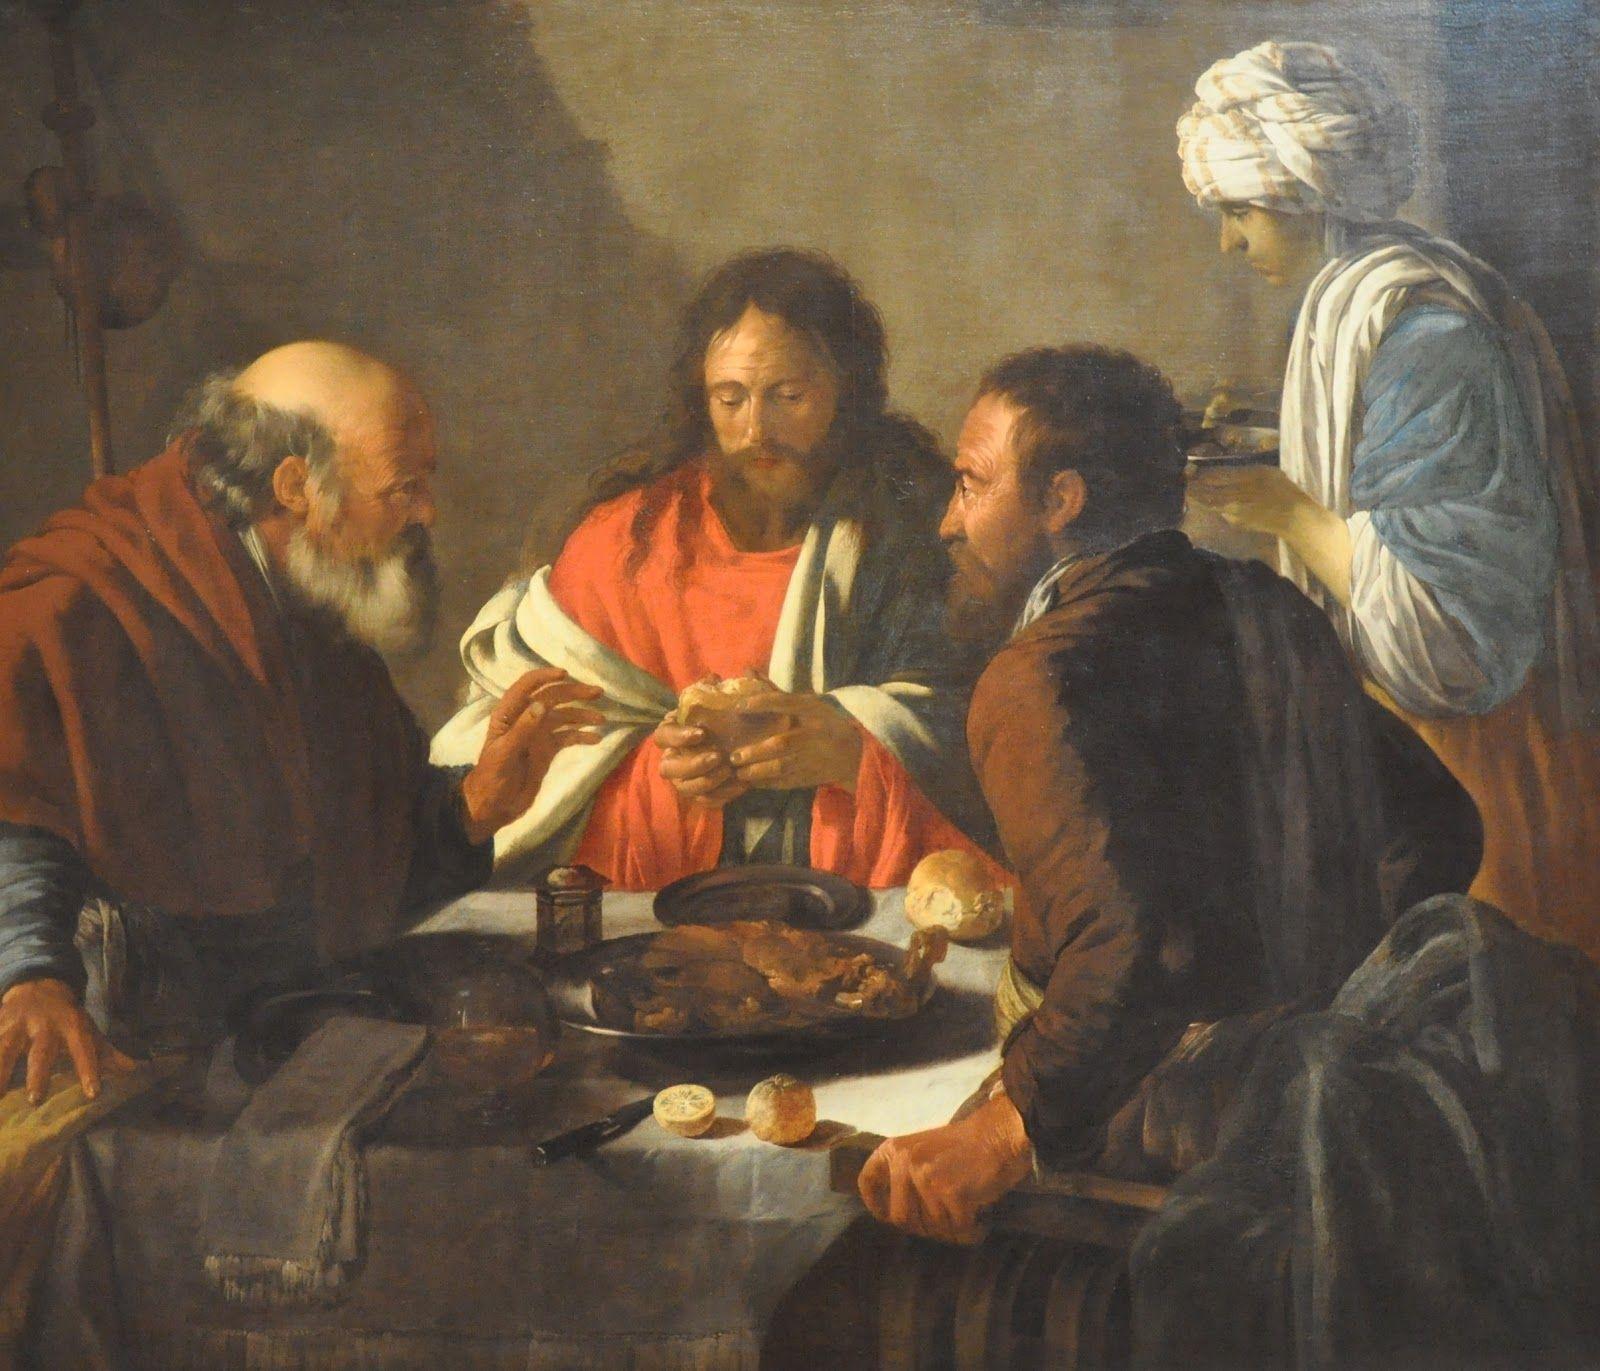 Supper Emmaus 1616 Hendrick Terbrugghen. Toledo